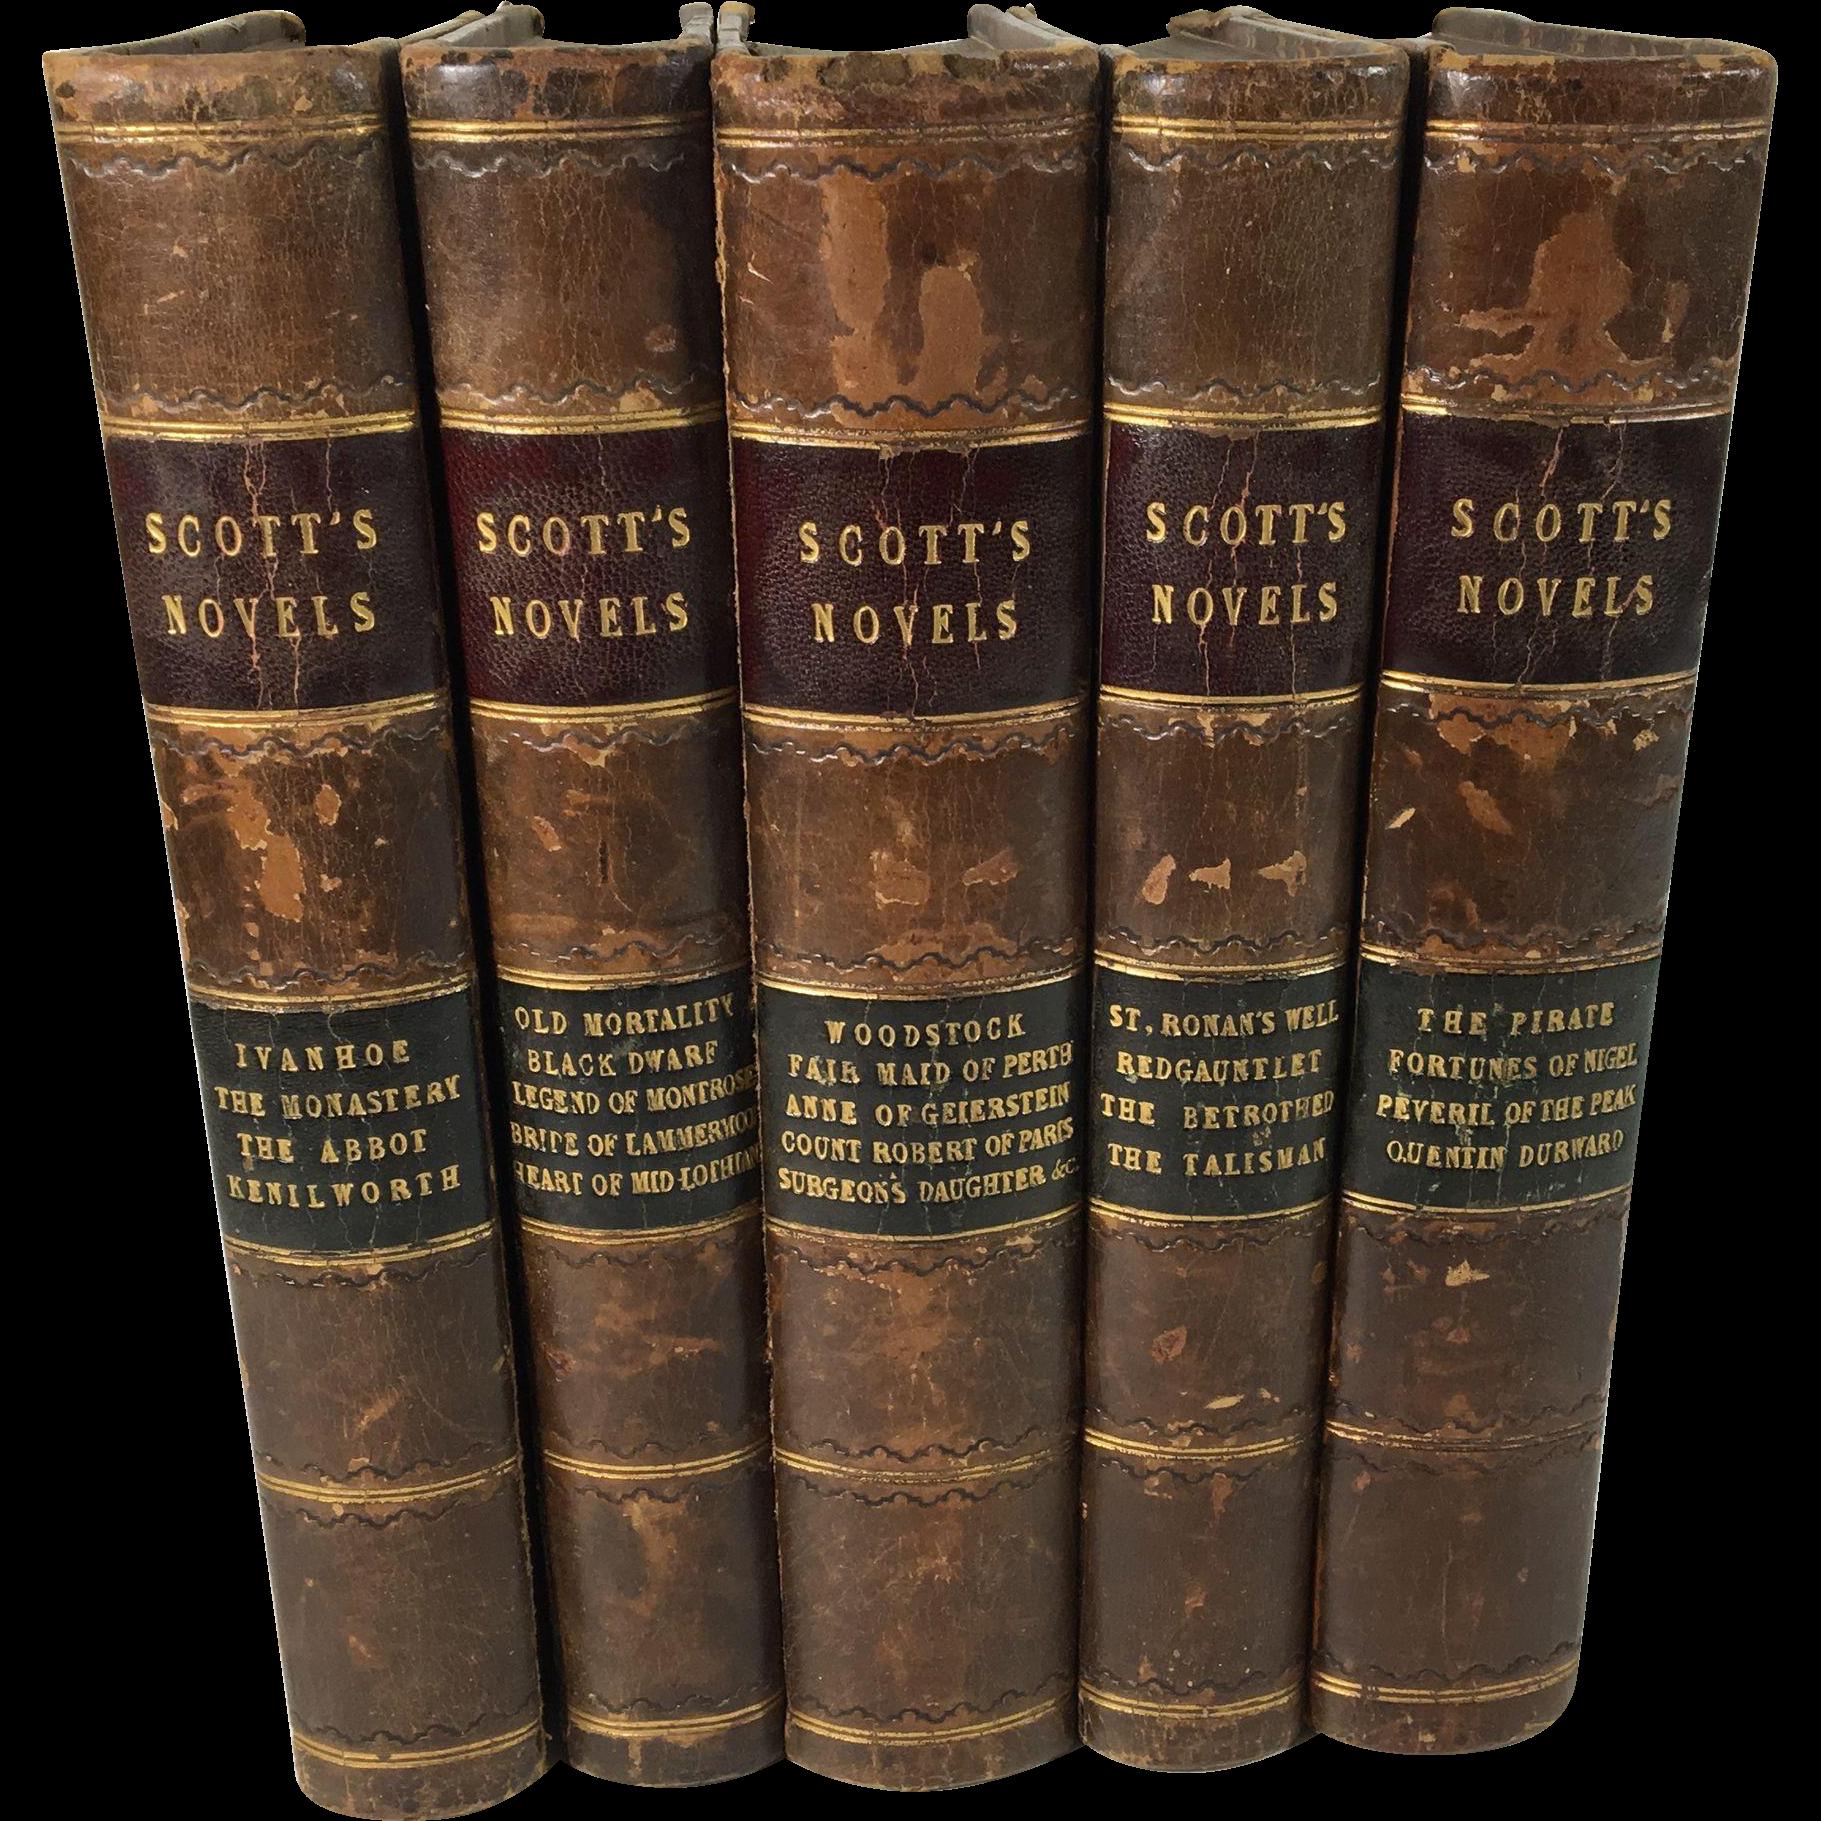 The Works of Sir Walter Scott, 21 Novels in Five Volumes, 1868, Edinburgh